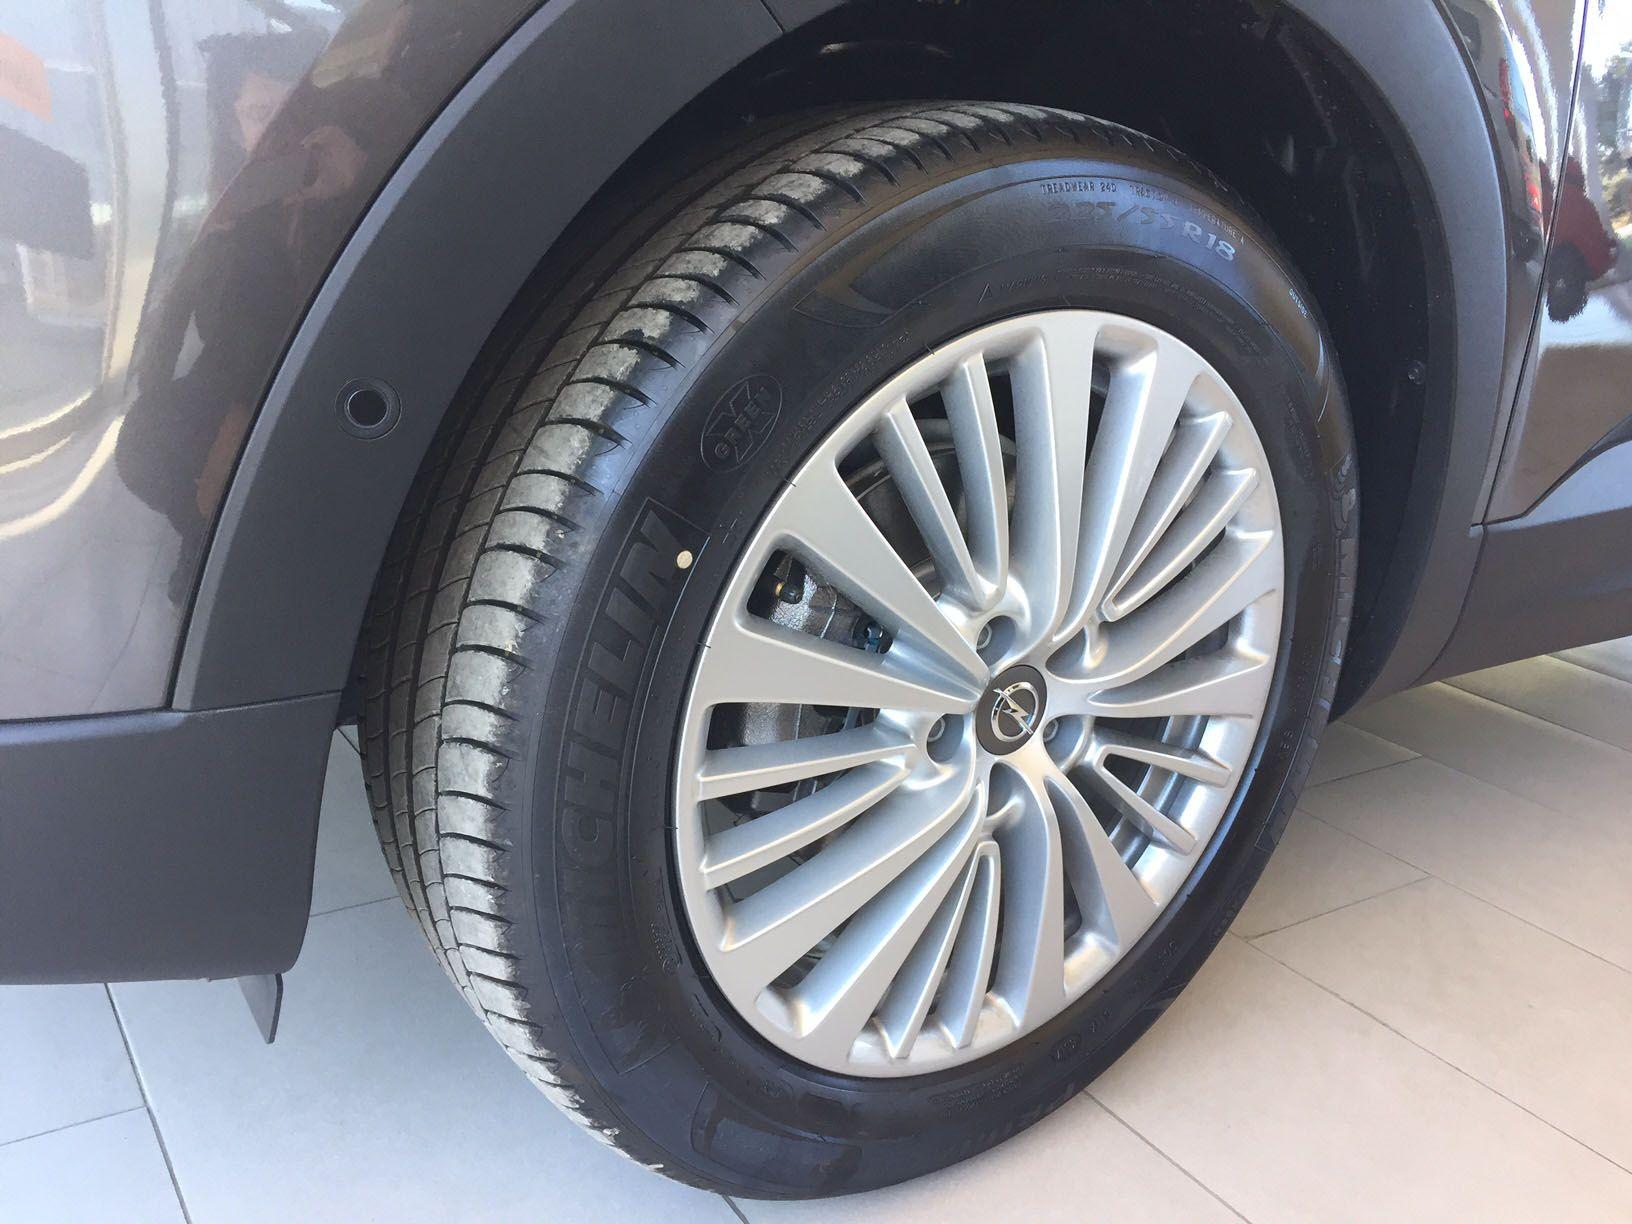 Neumáticos prohibidos